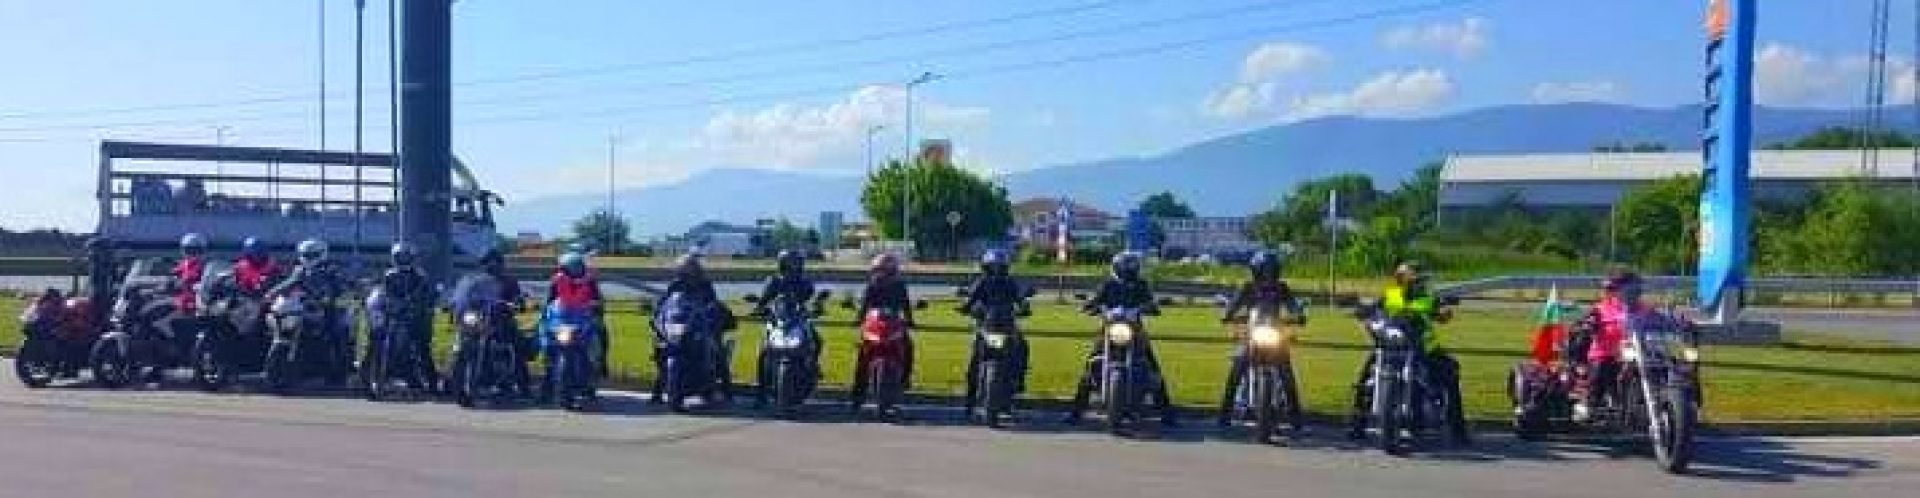 Жените мотористи